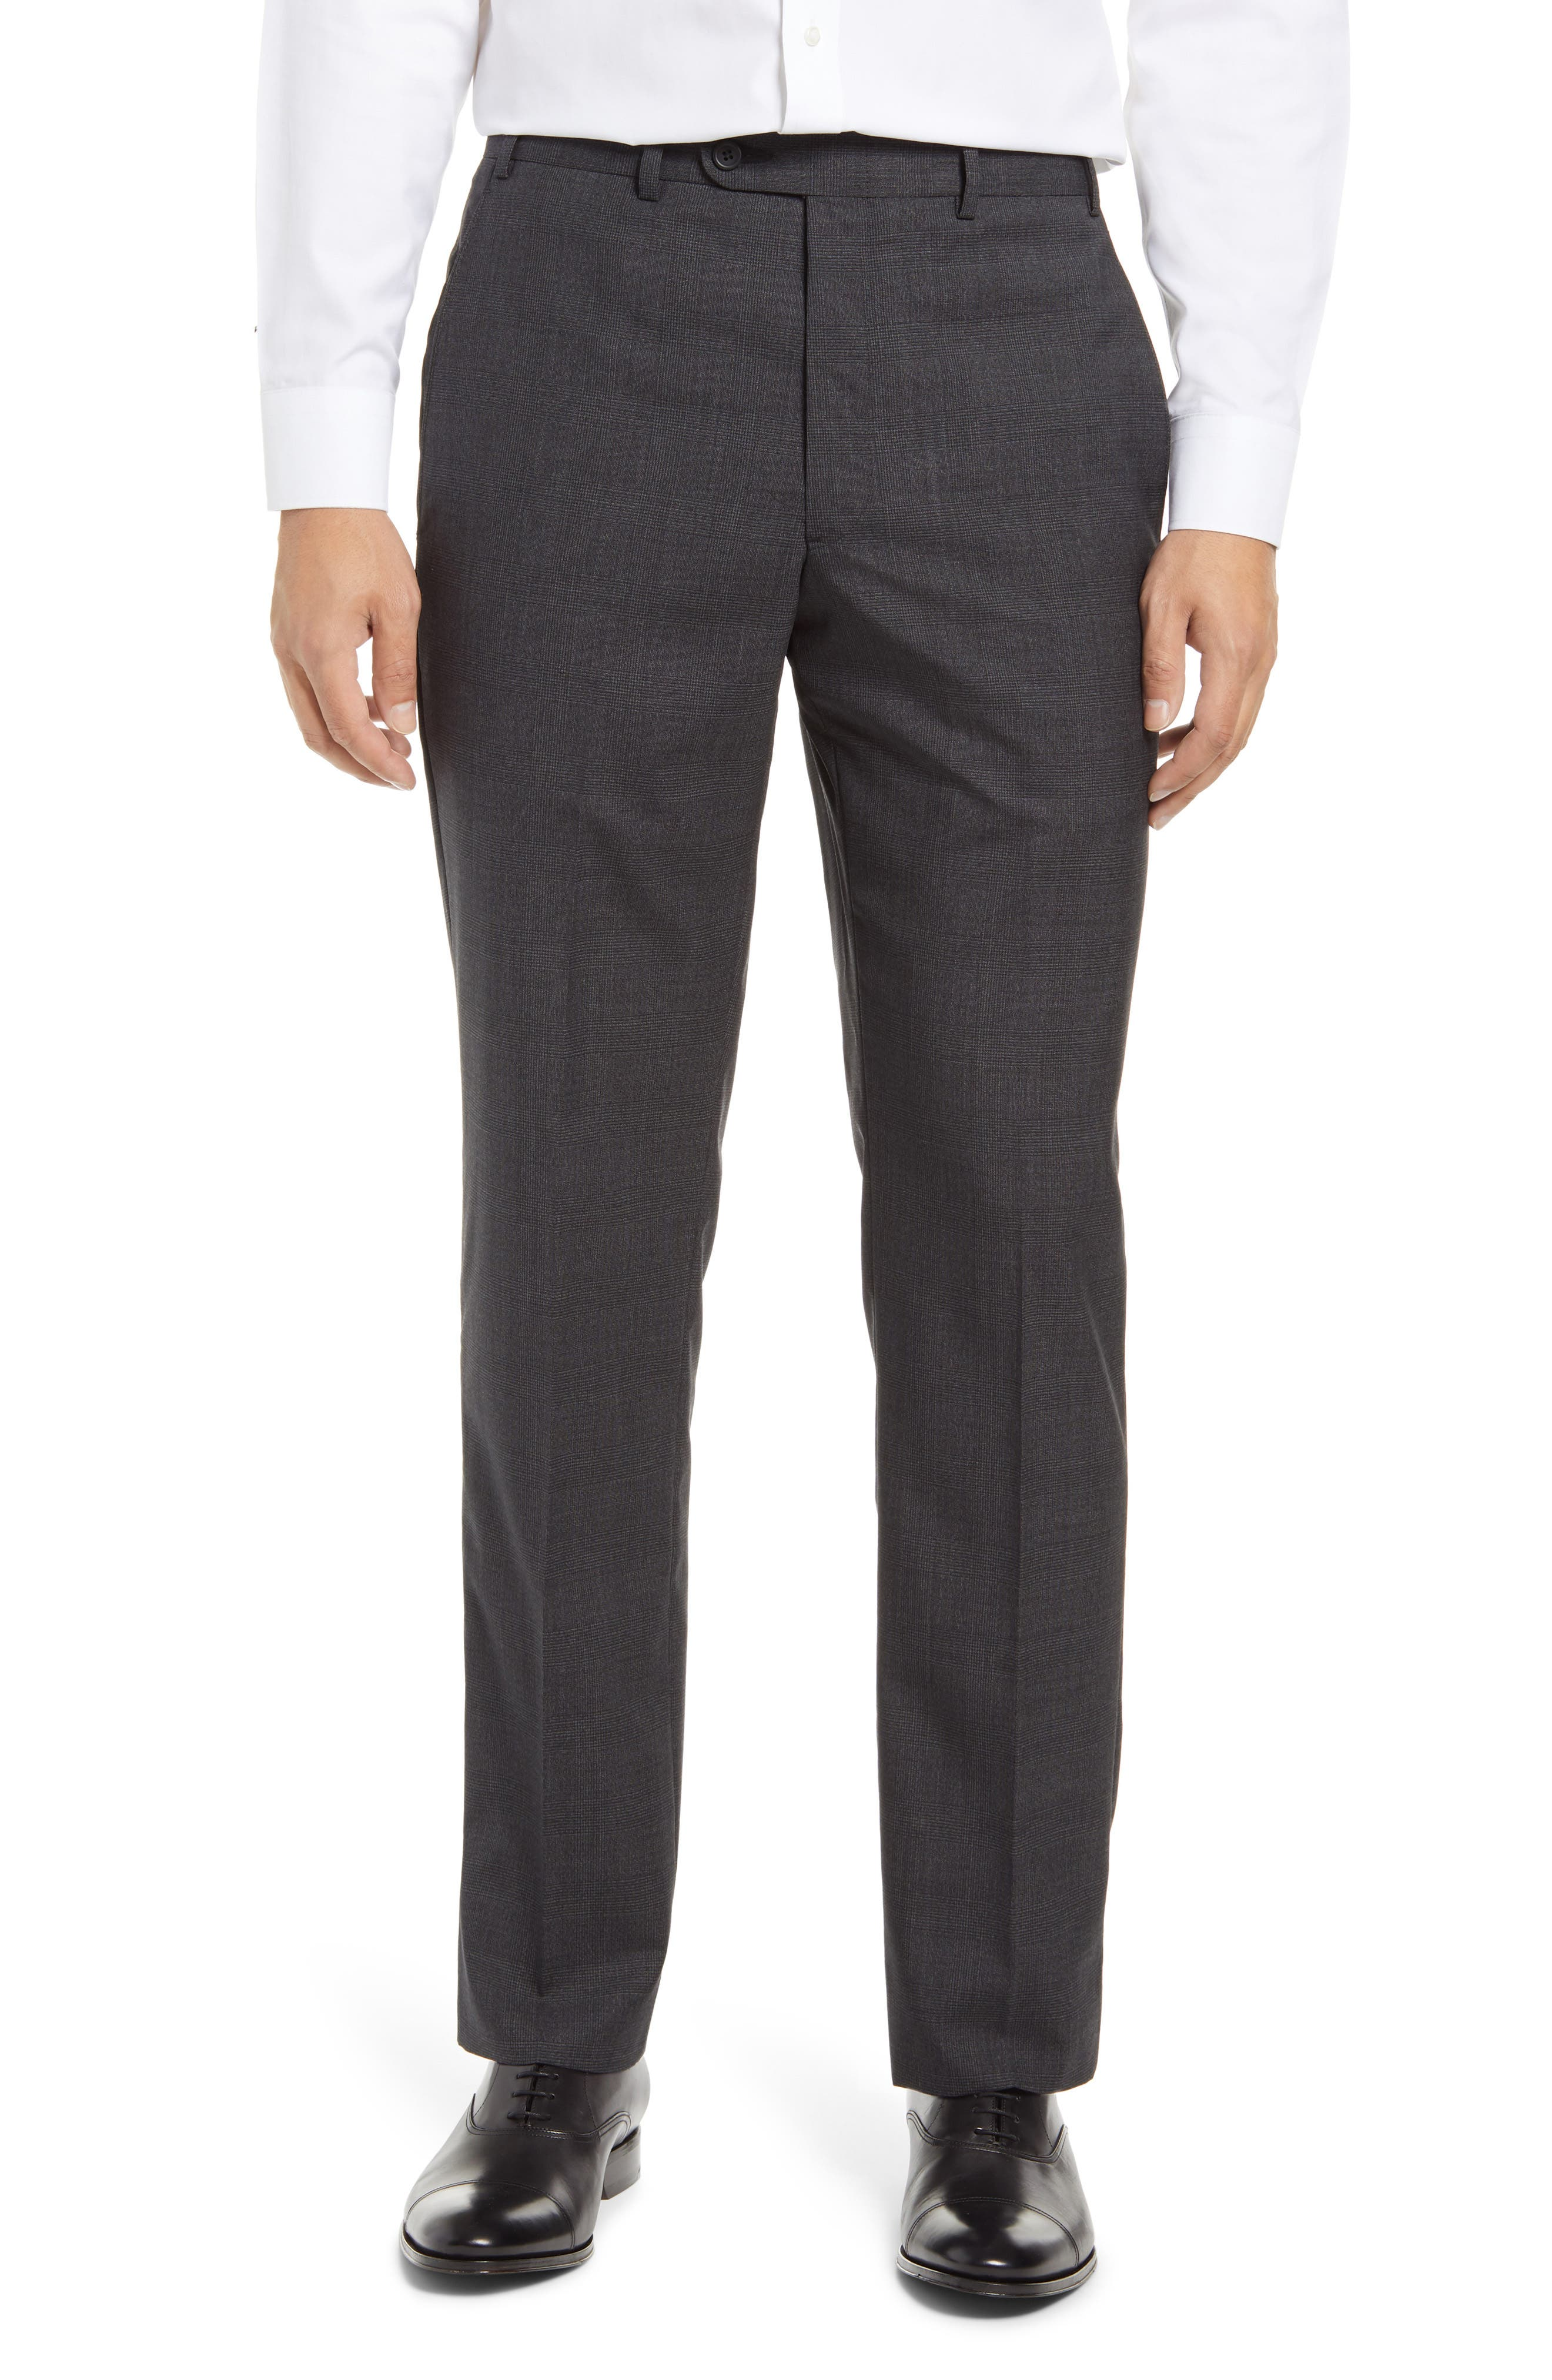 Image of John W. Nordstrom Torino Flat Front Glen Plaid Wool Pants